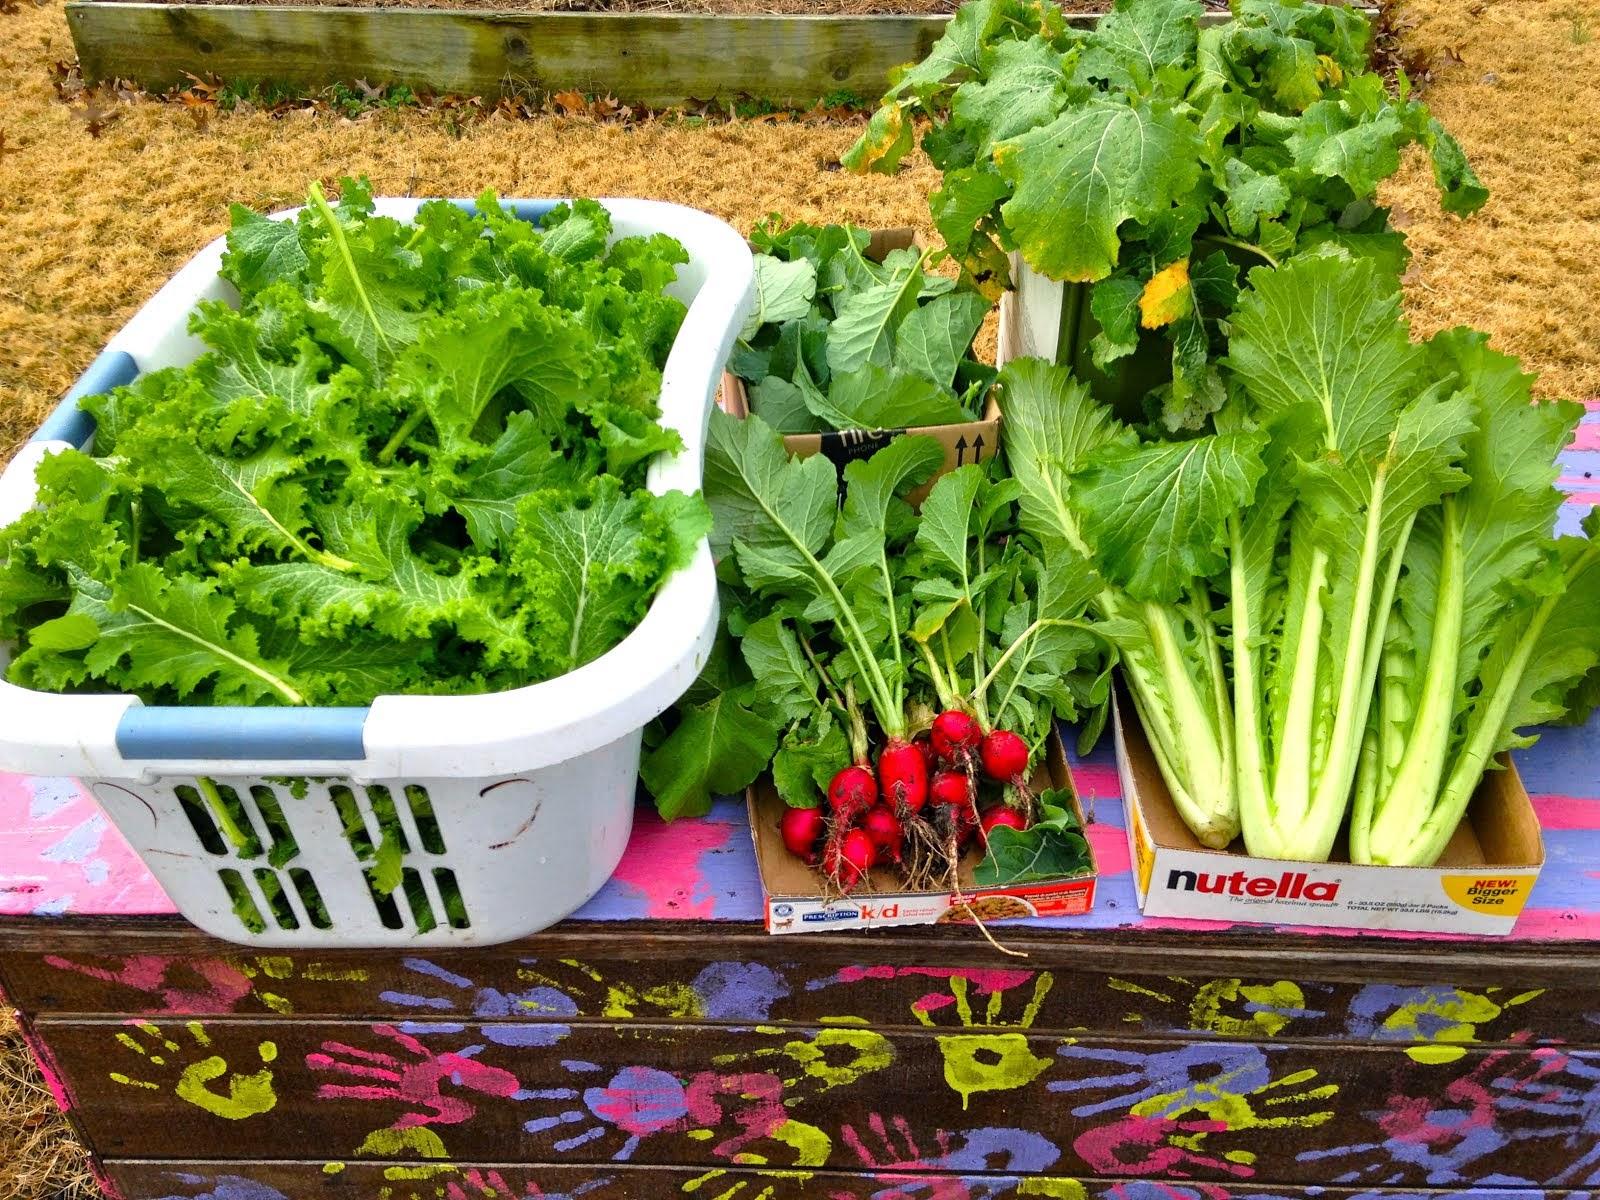 2014 Harvest Donation: 3,286 lb